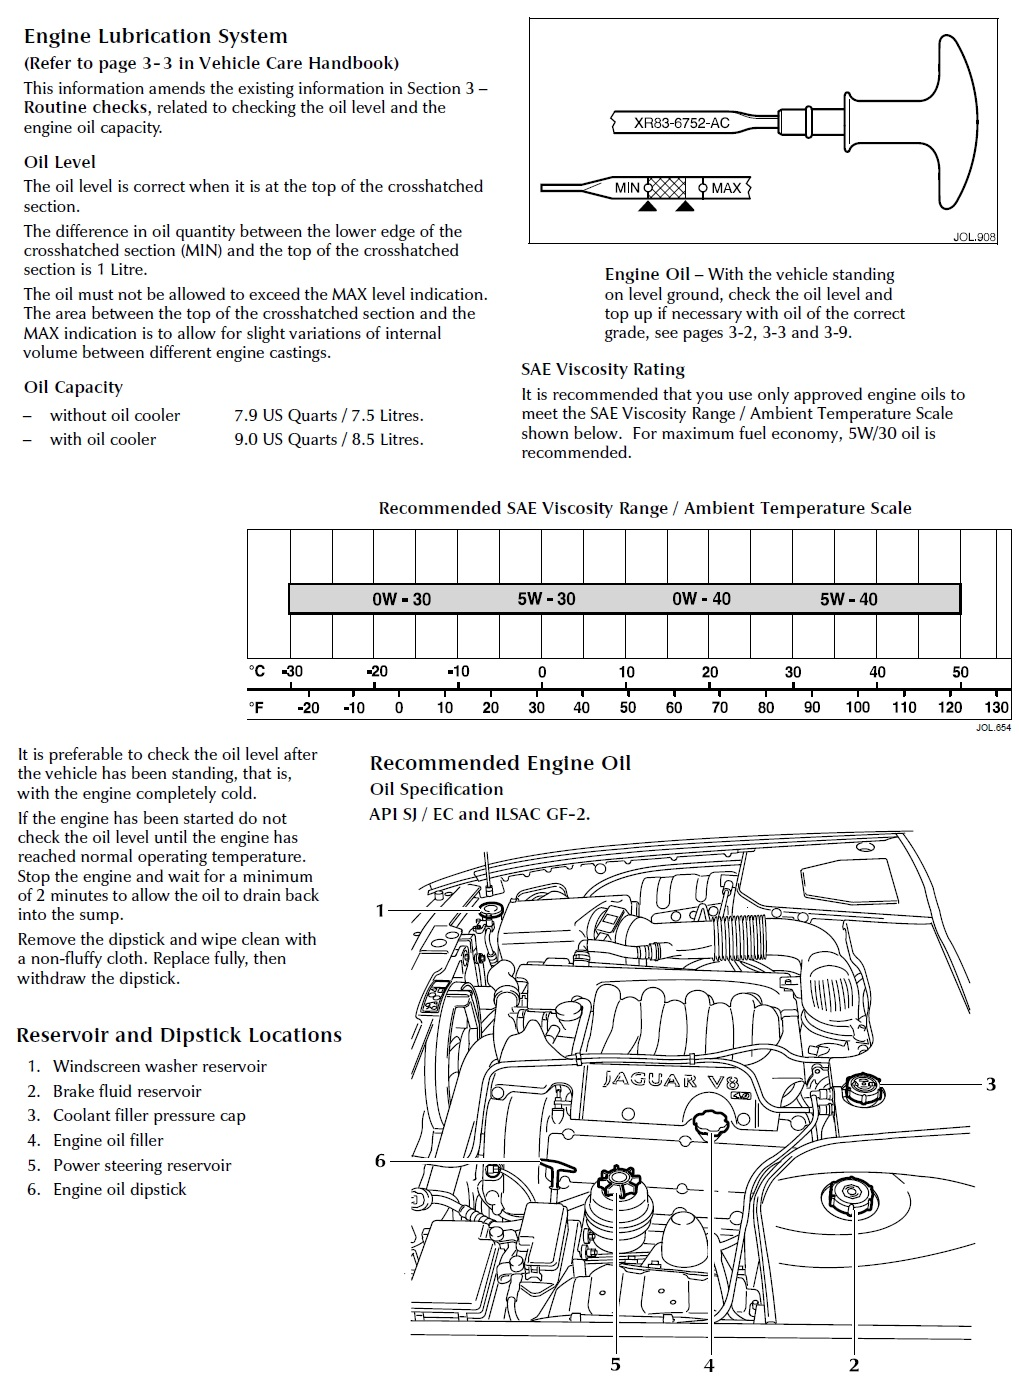 hight resolution of jaguar xk8 engine oil filter diagram enthusiast wiring diagrams u2022 rh rasalibre co 1997 jaguar xk8